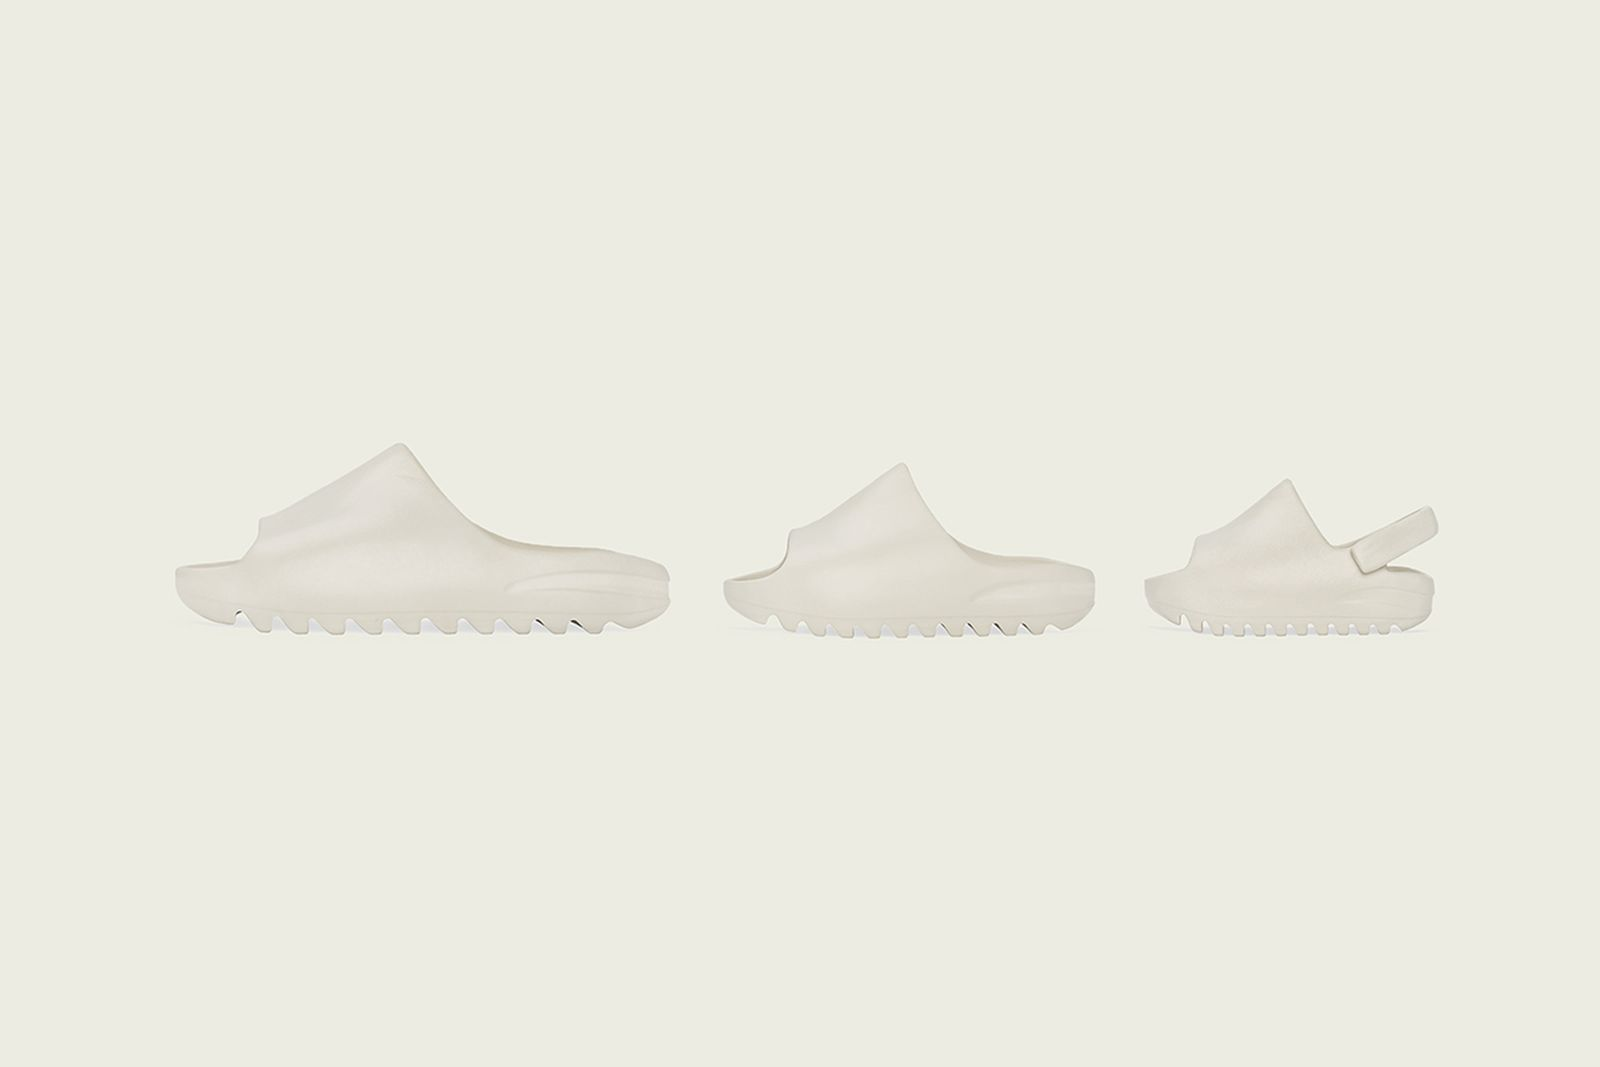 adidas-yeezy-slide-release-date-price-04